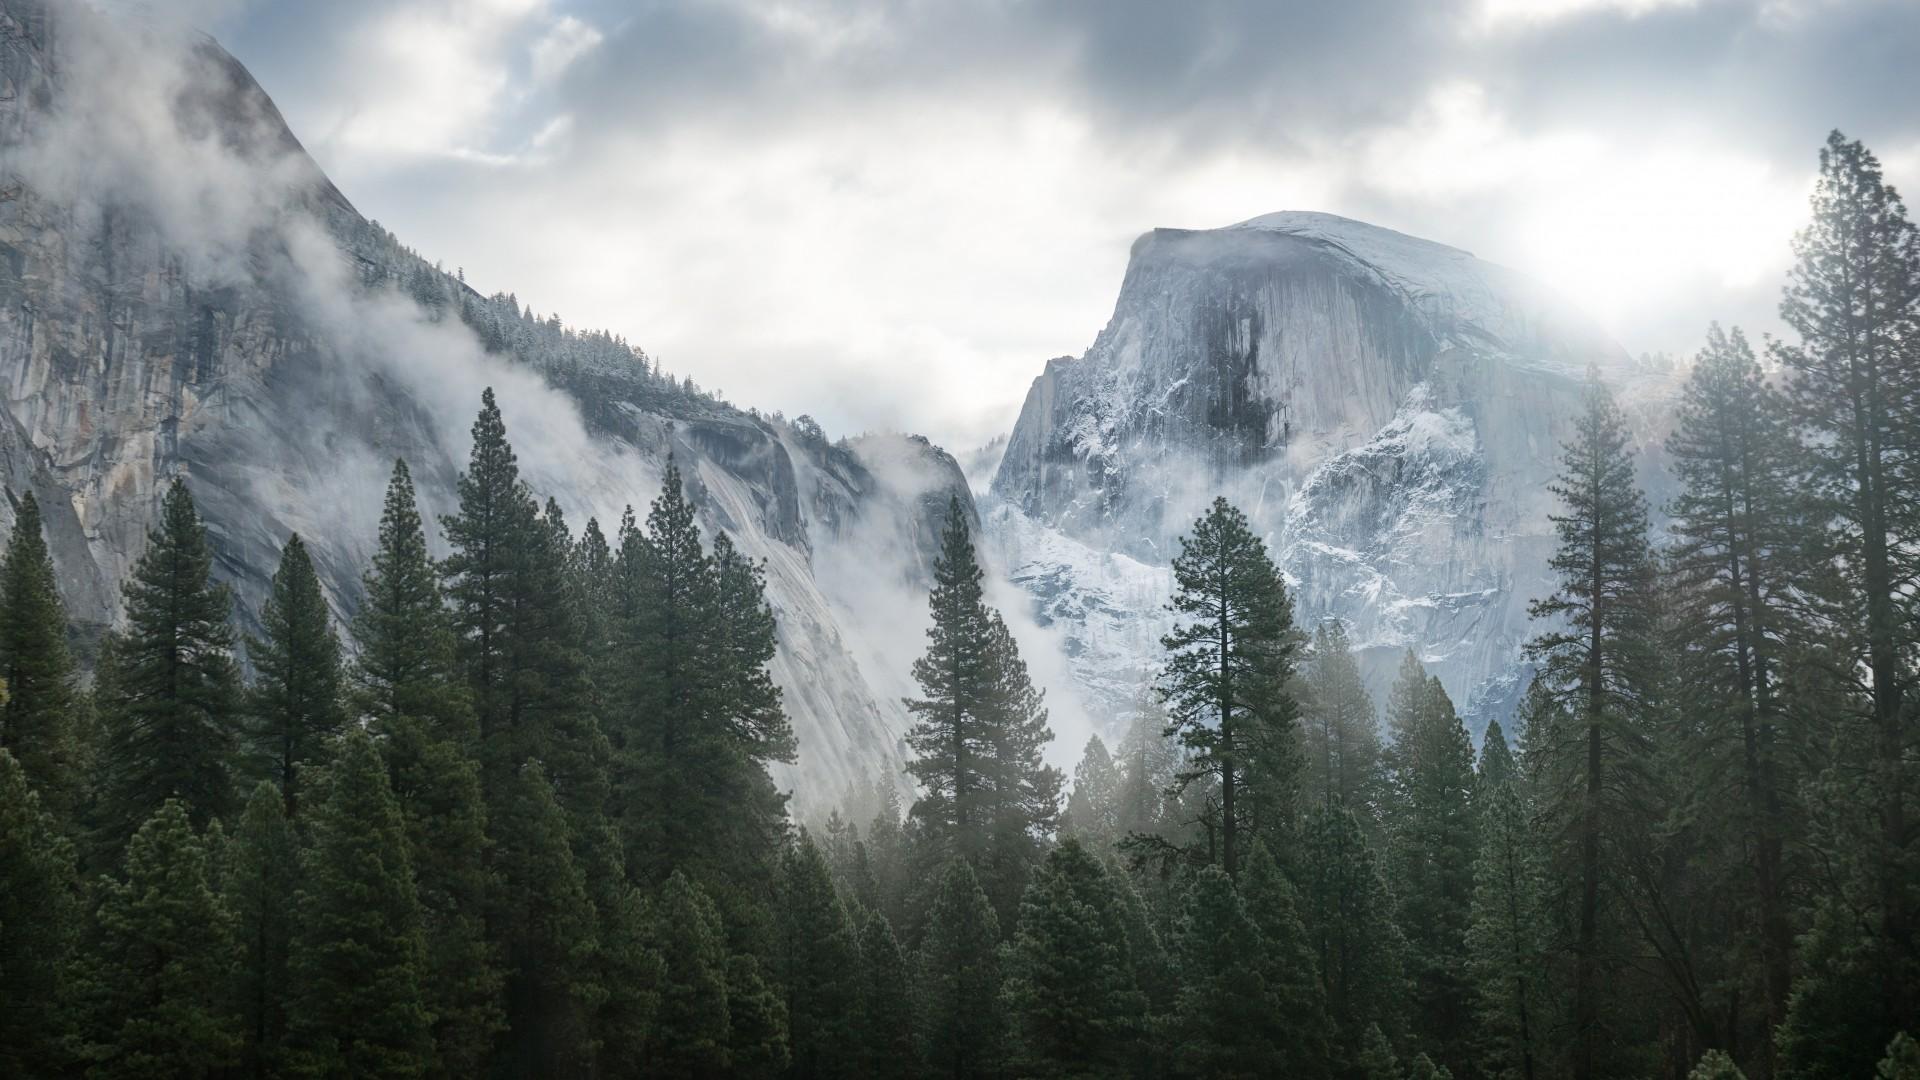 Wallpaper Yosemite 5k 4k Wallpaper 8k Forest Osx Apple